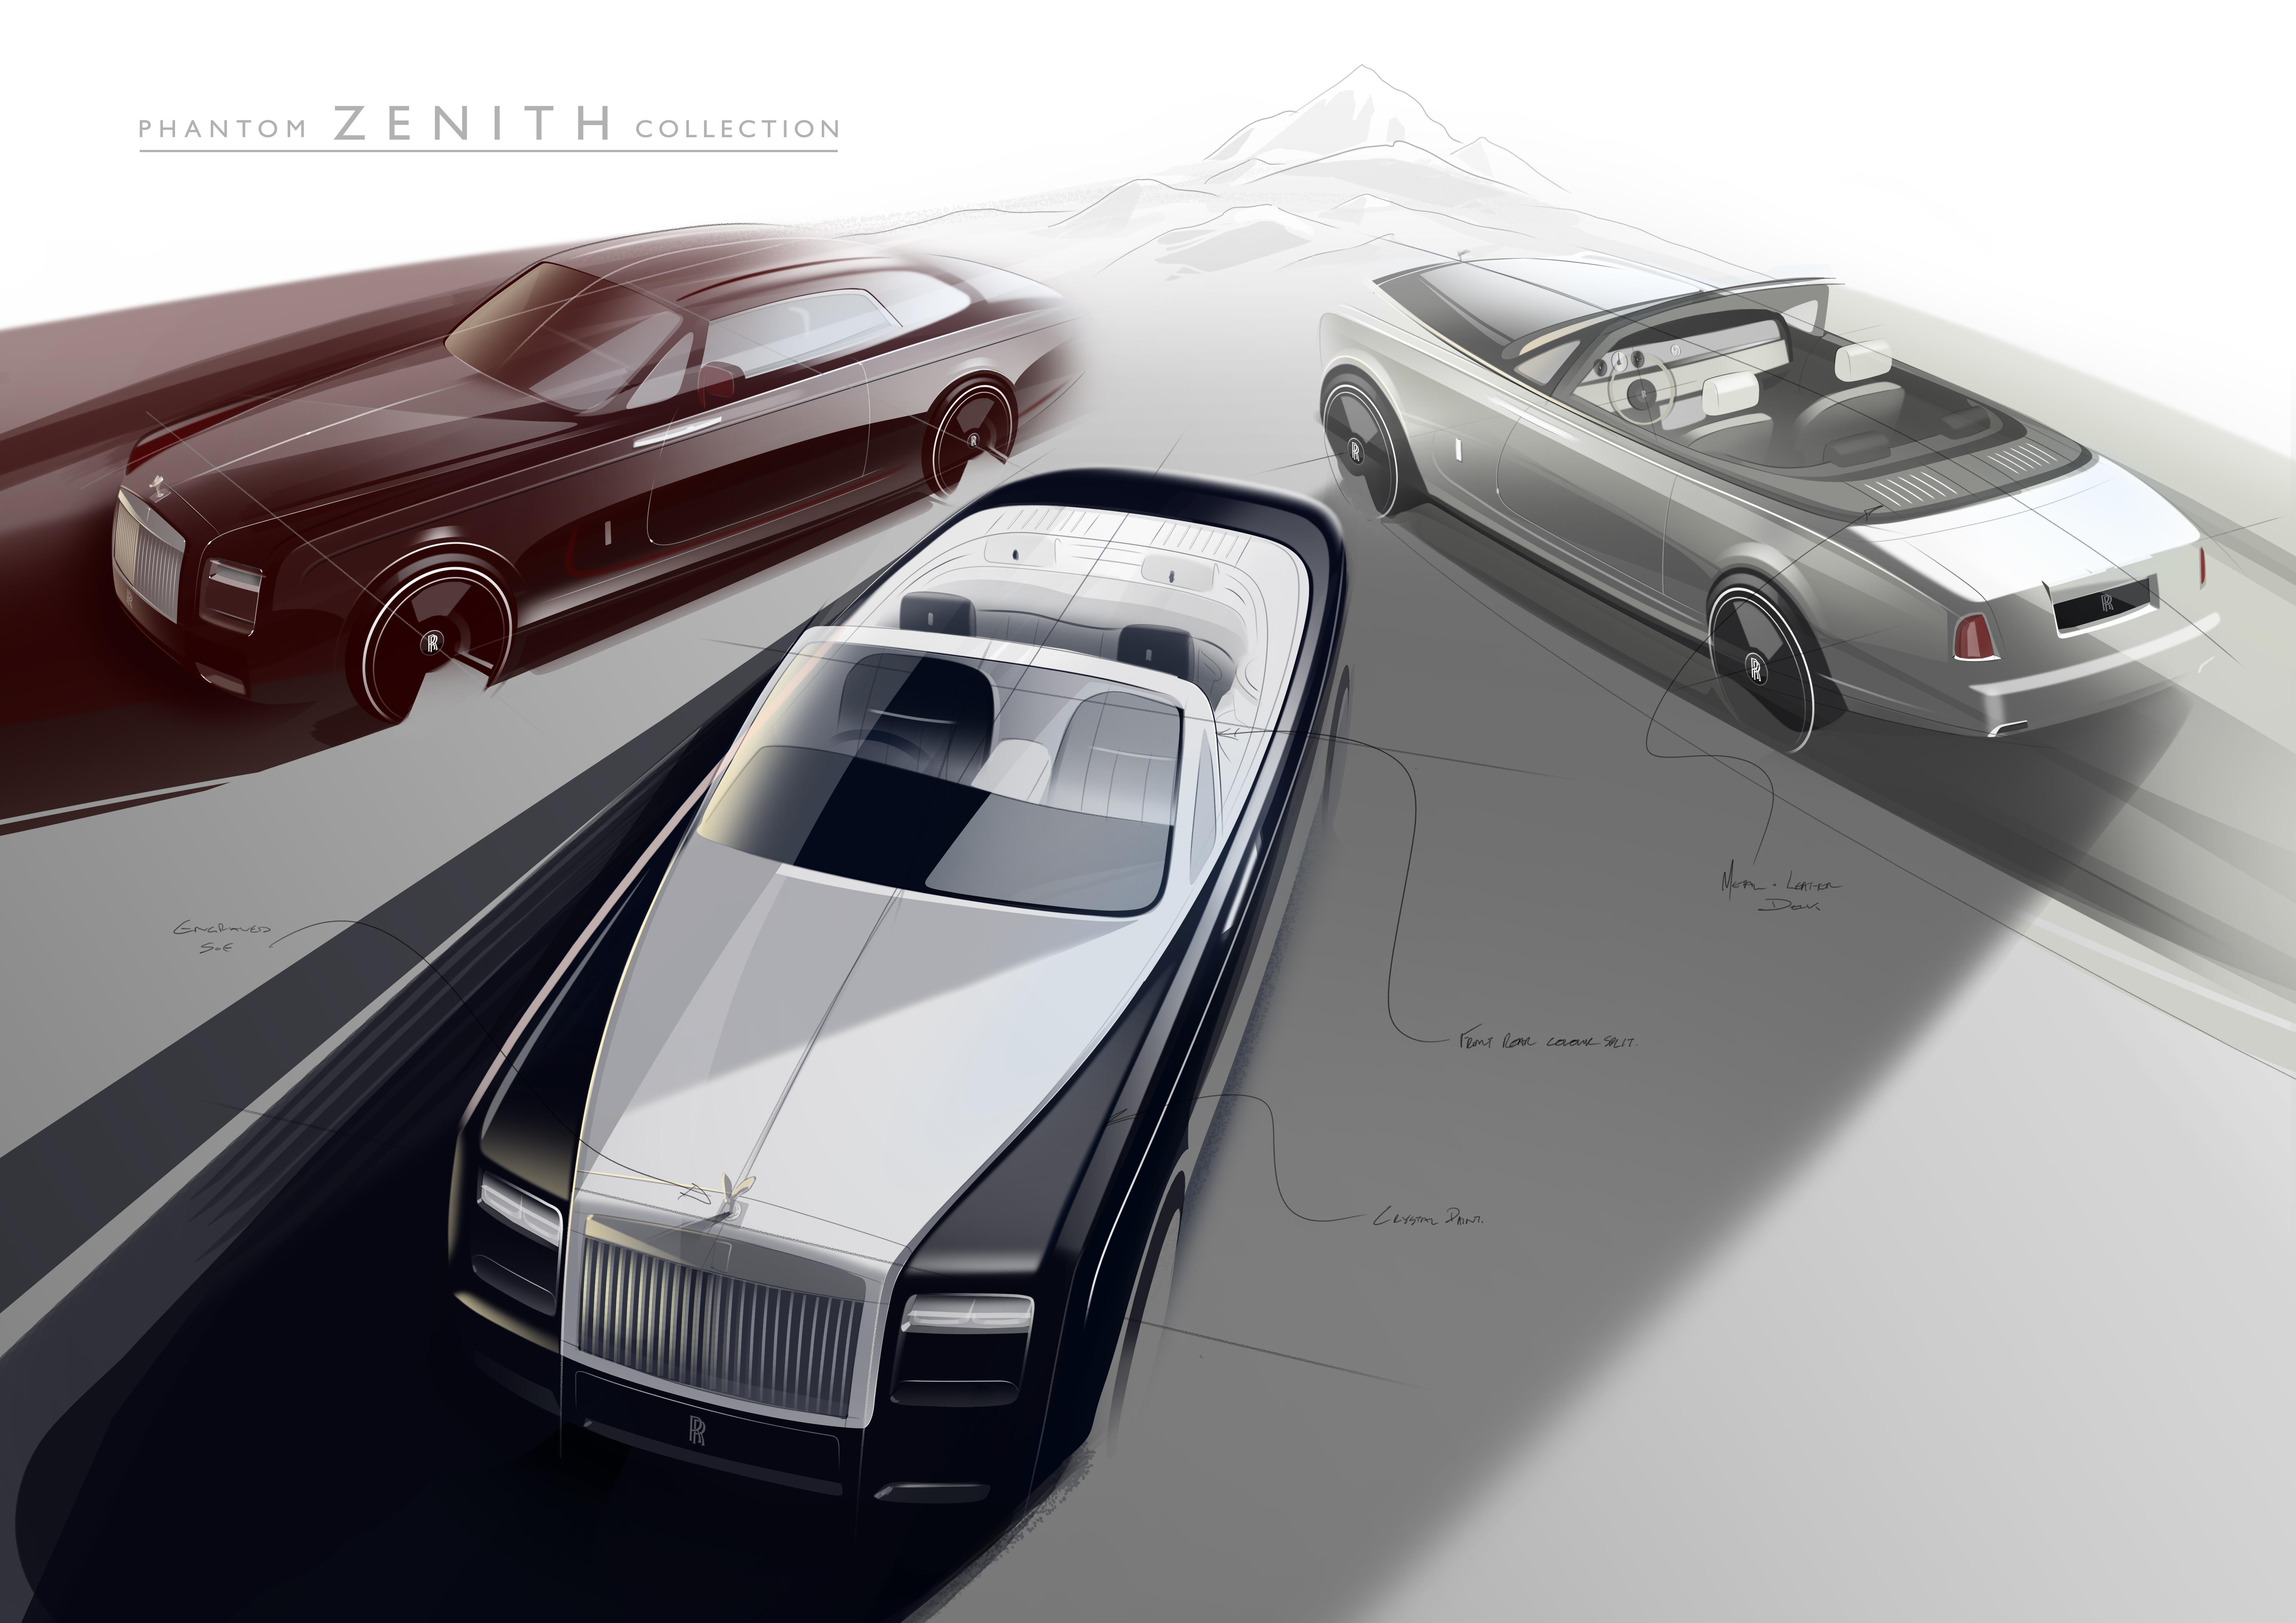 ROLLS ROYCE MOTOR CARS BRINGS SEVENTH GENERATION OF PHANTOM TO AN